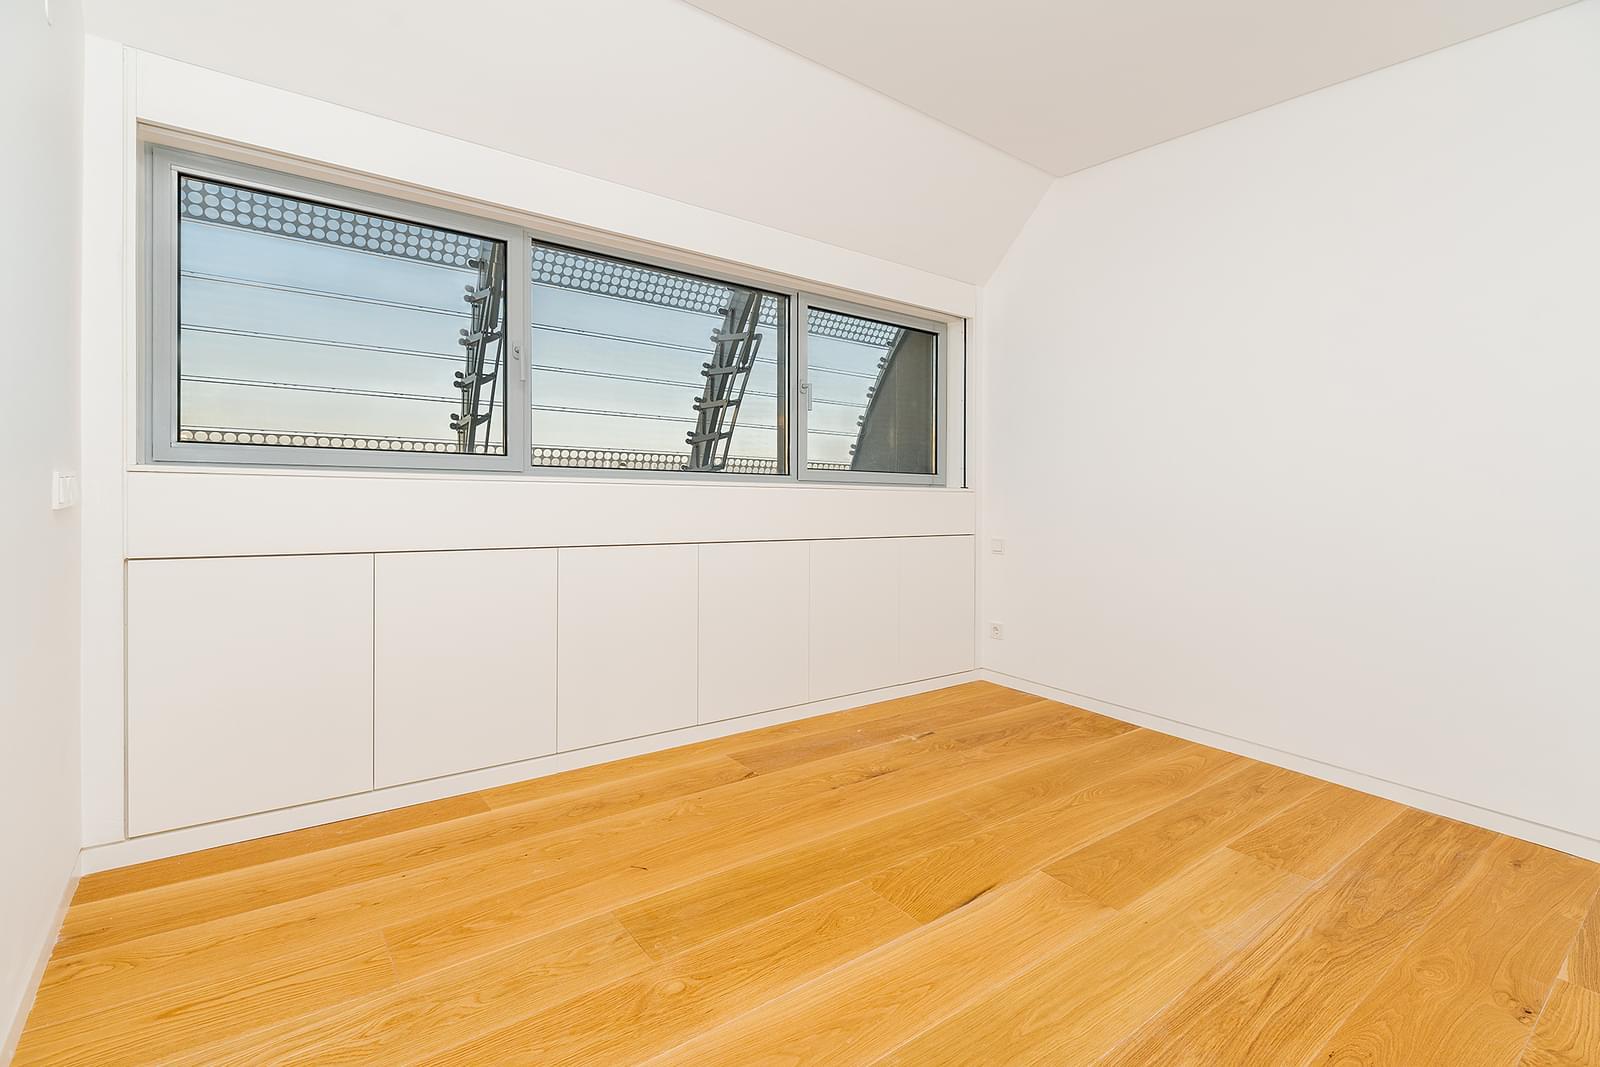 pf18713-apartamento-t3-lisboa-449c3d6b-004c-4df0-81b1-88f39fdae1cc